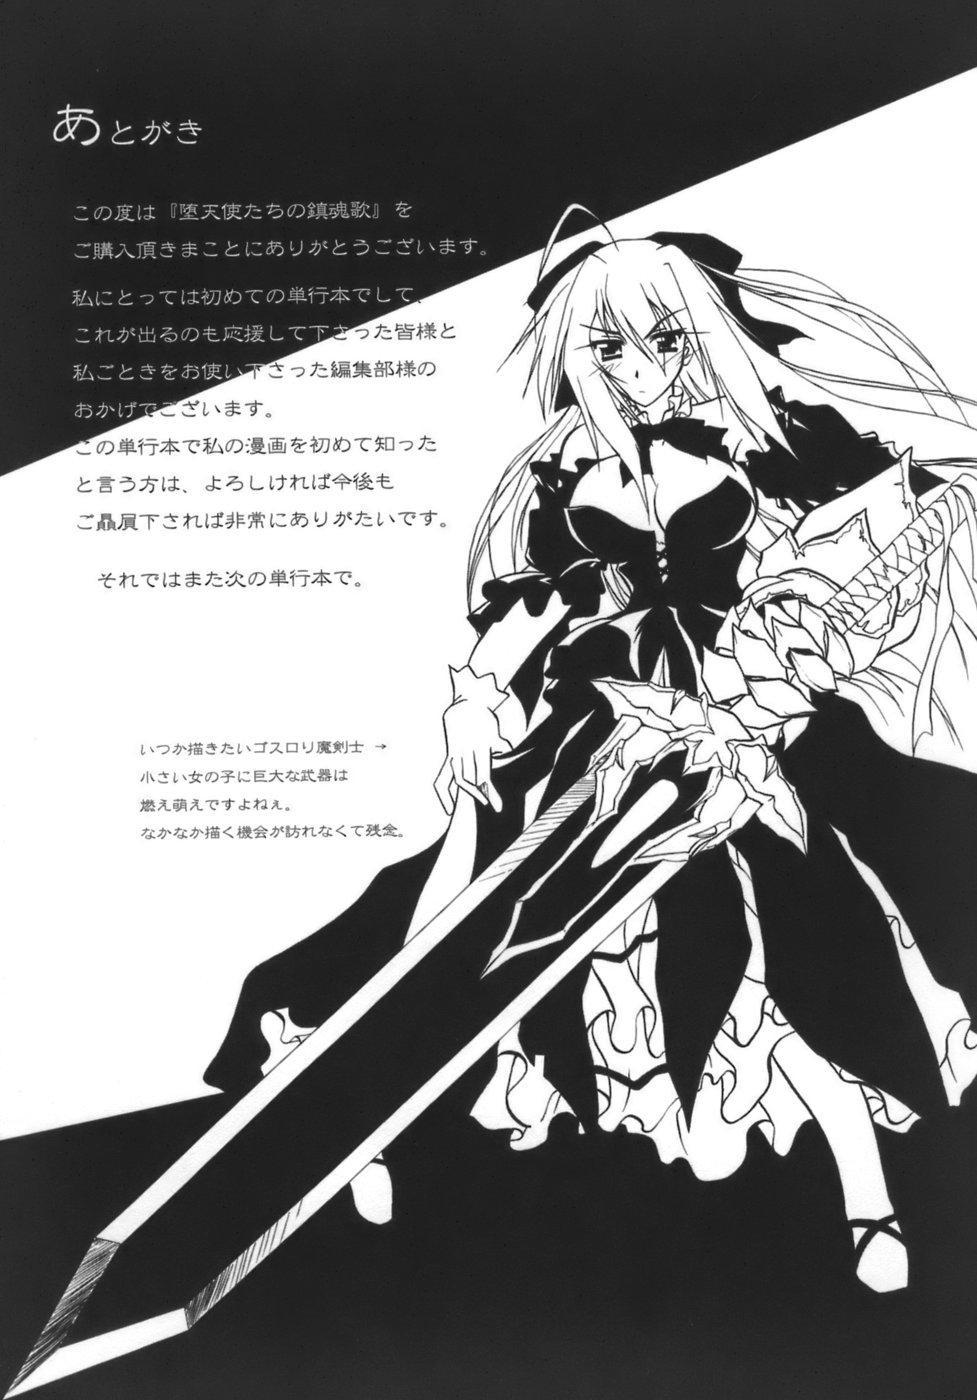 [Parfait] Datenshi-tachi no Chinkonka - Fallen Angels Requiem 155